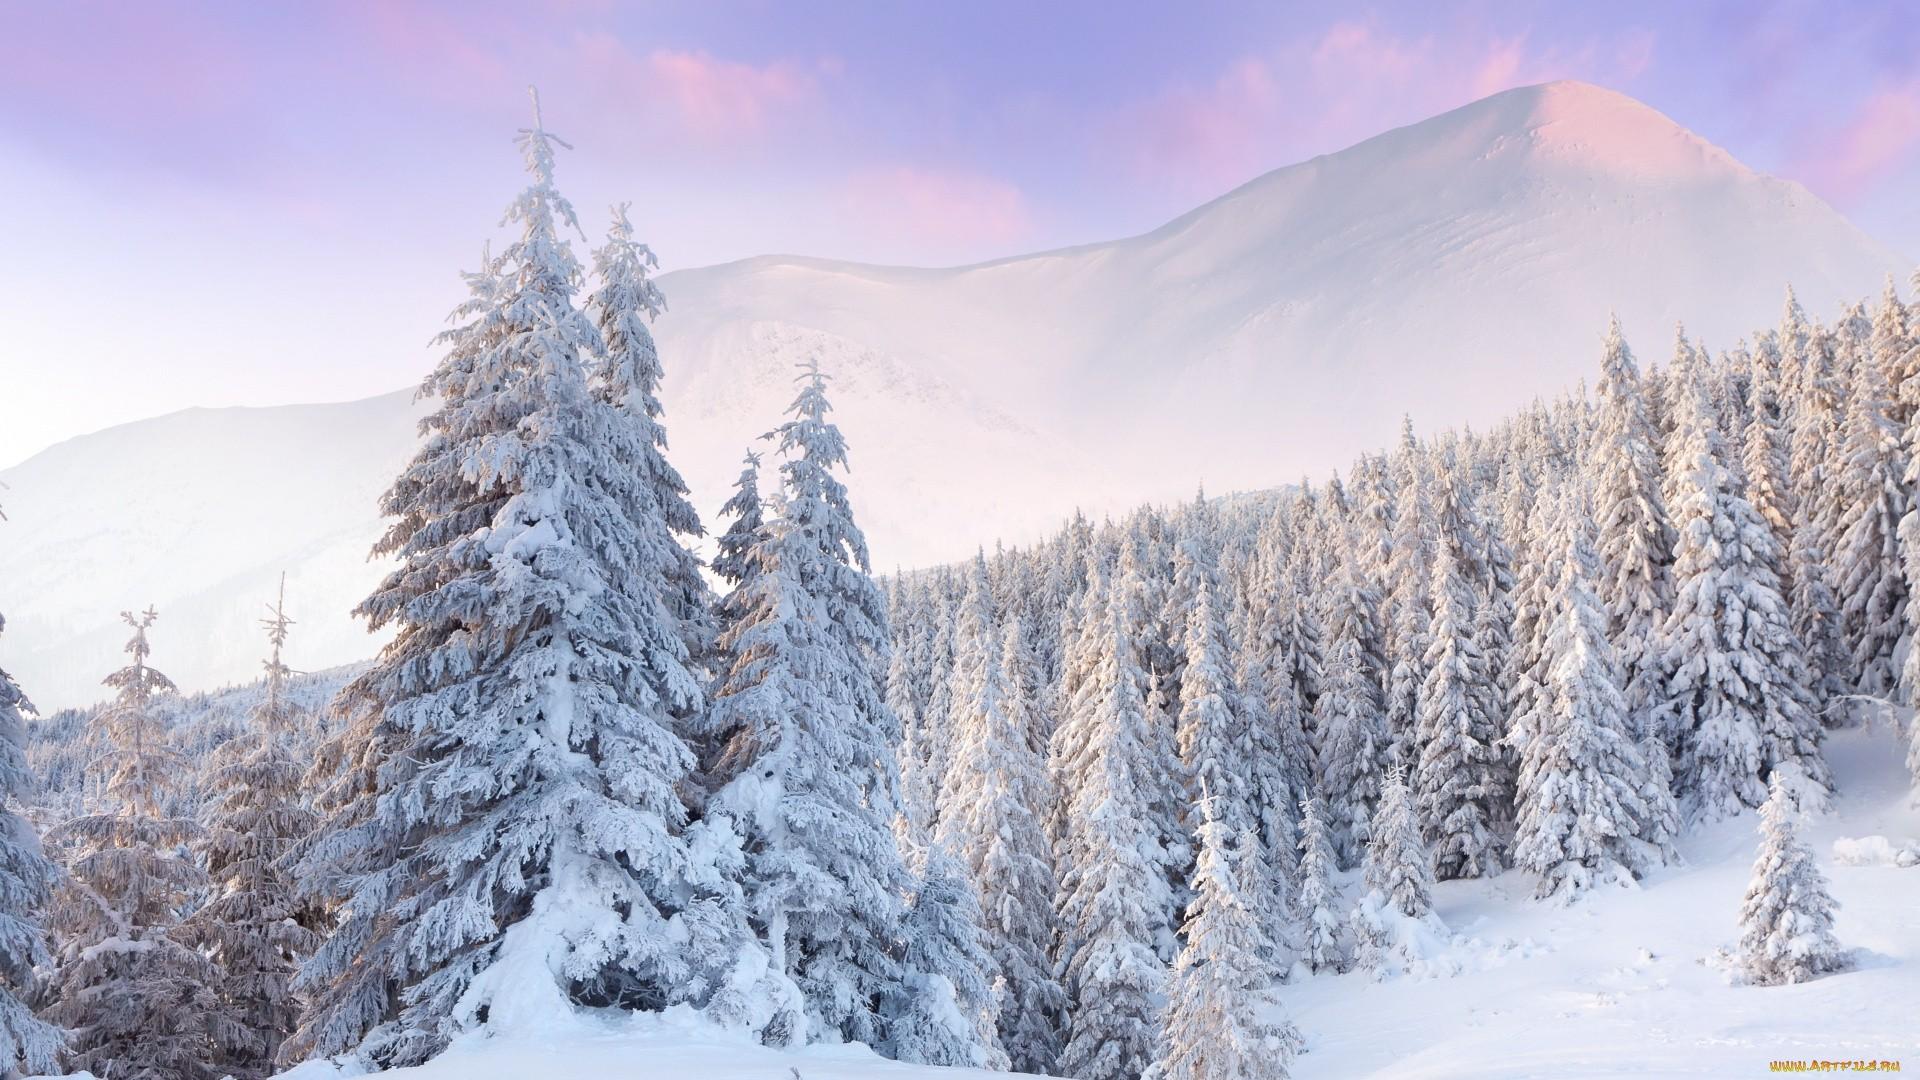 Snowy Free Wallpaper